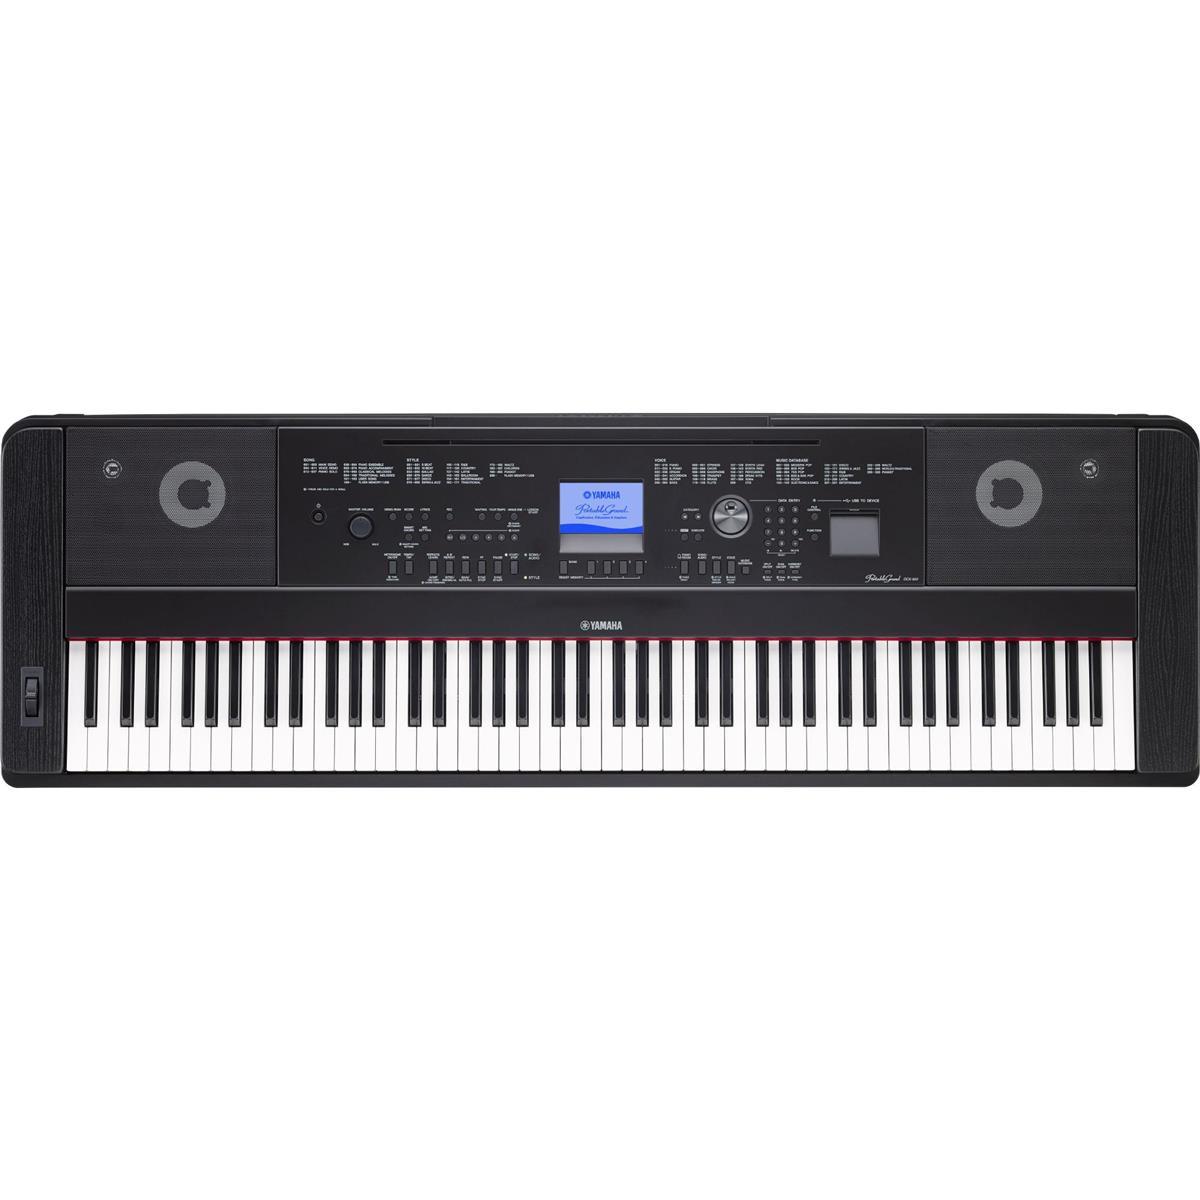 Yamaha DGX-660 88 Keys Portable Grand Digital Piano $650 + Free Shipping